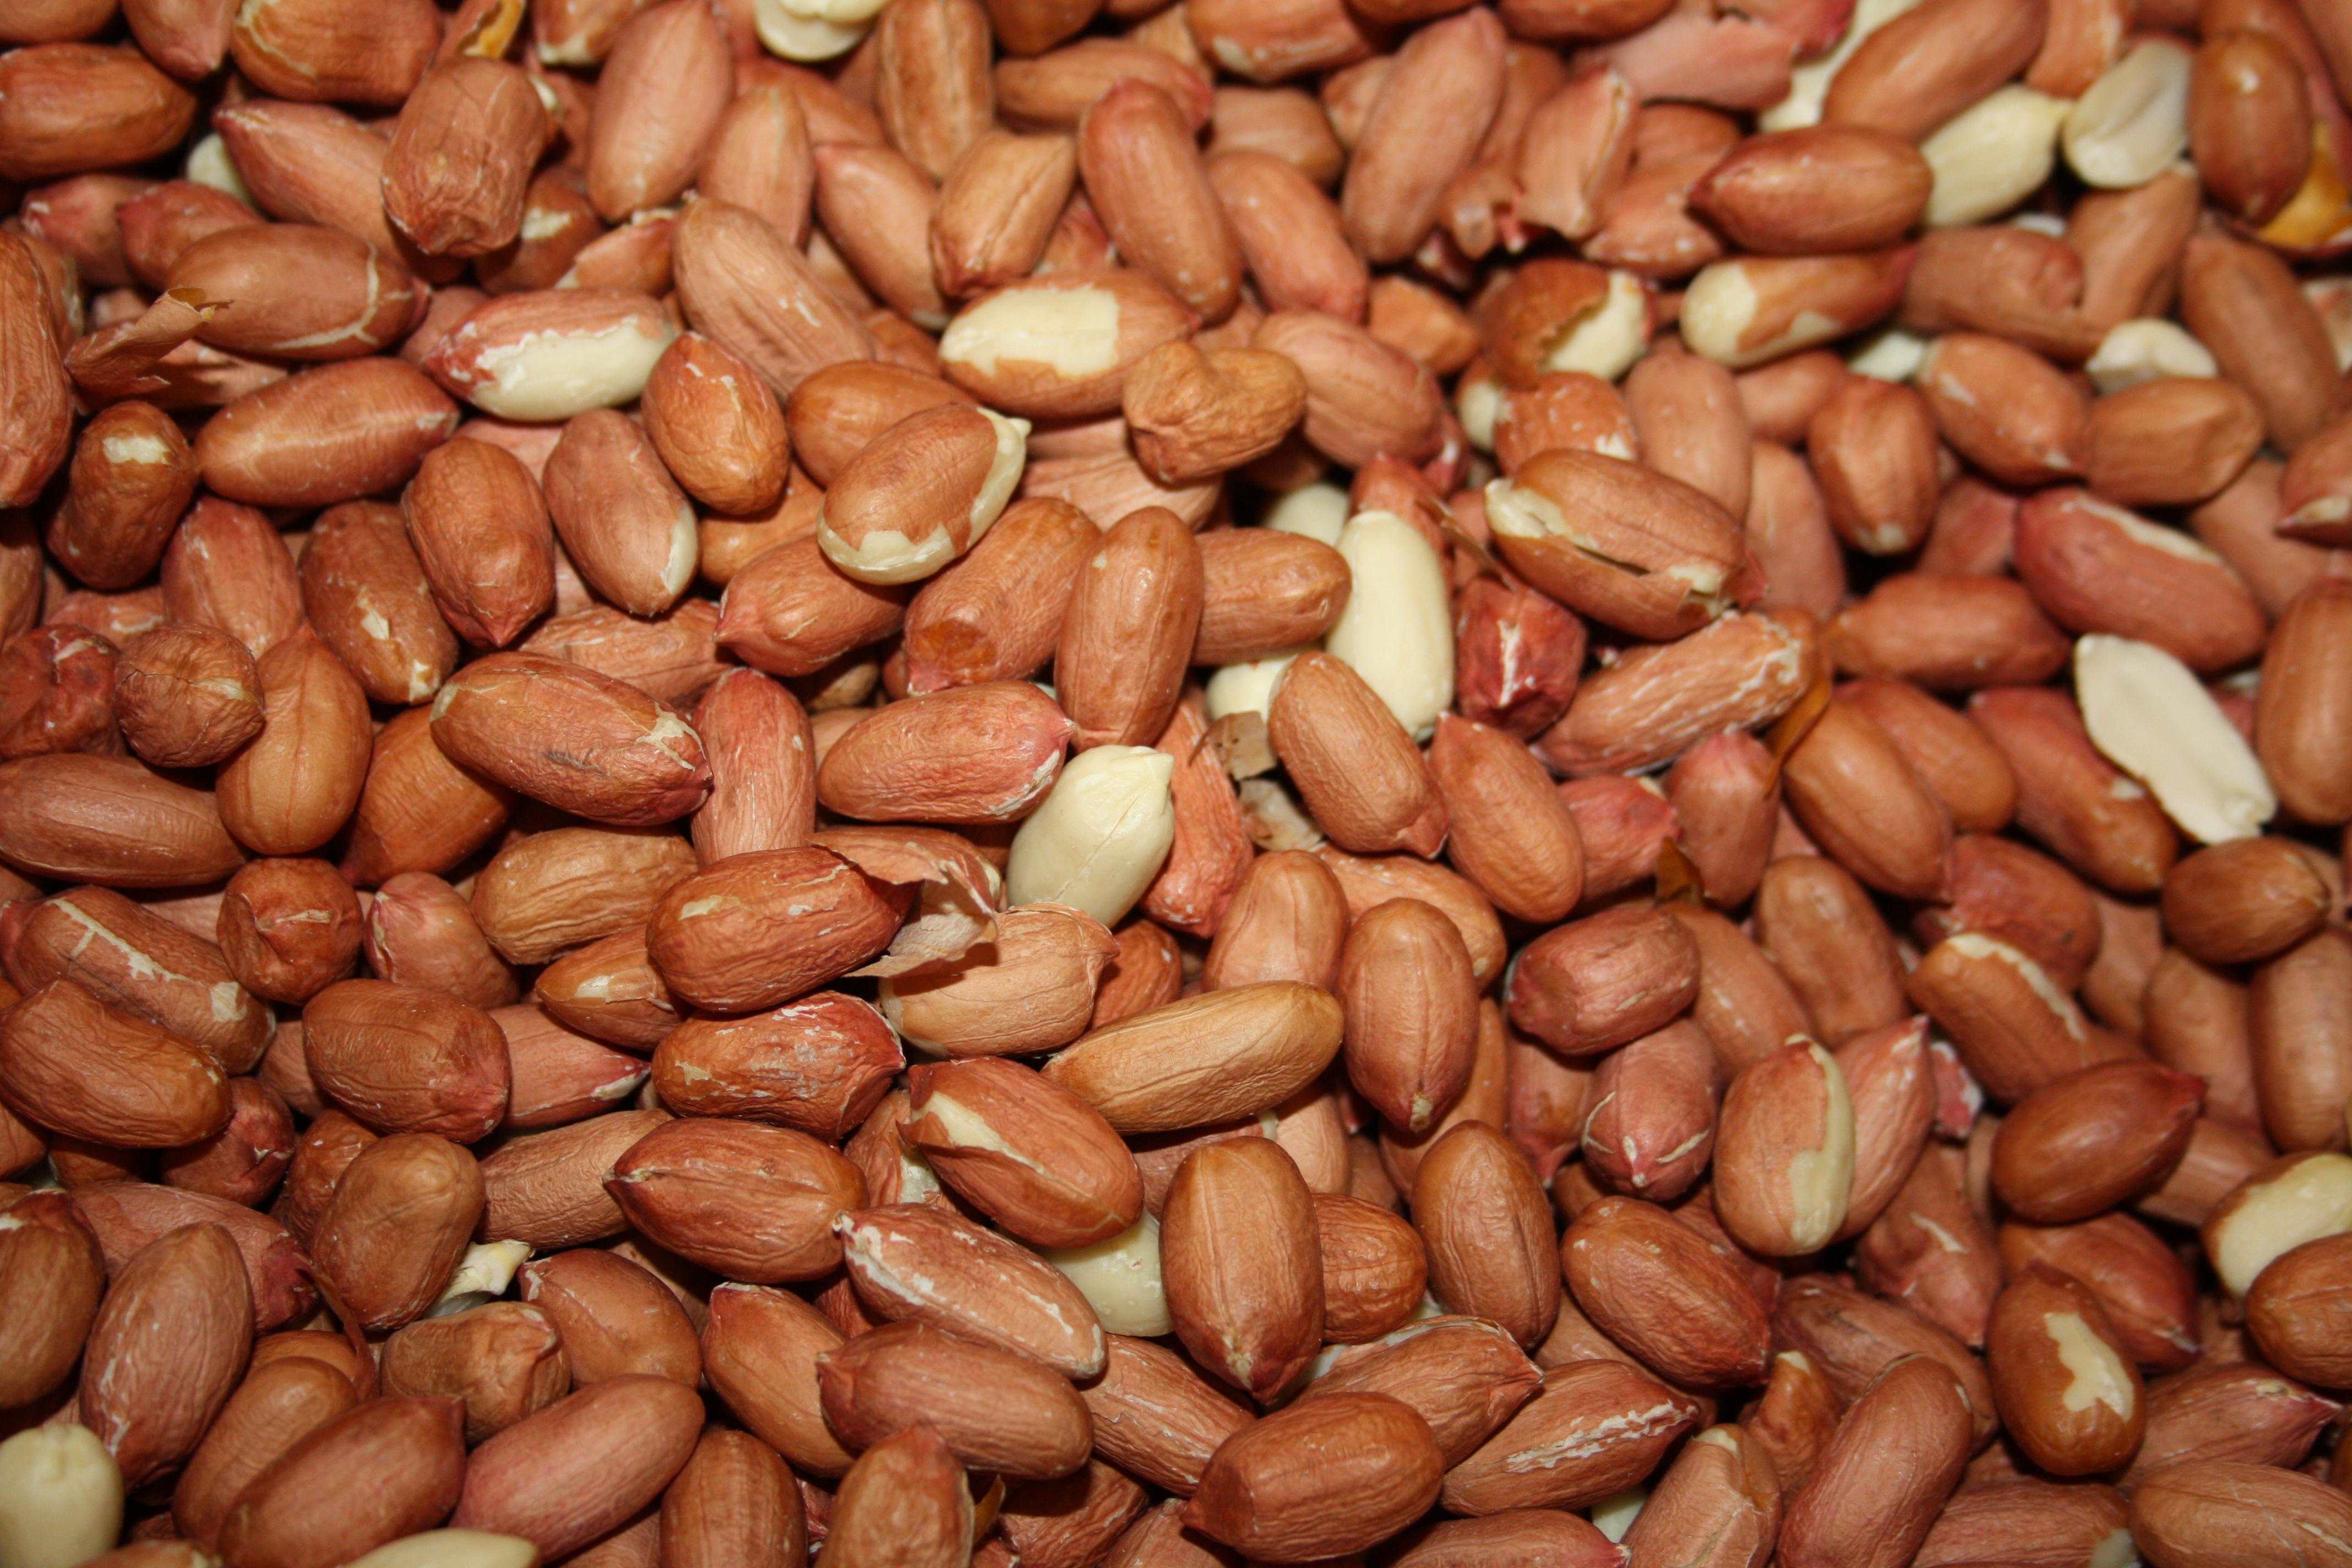 Natural Raw Peanuts (Soudani)   Cananut